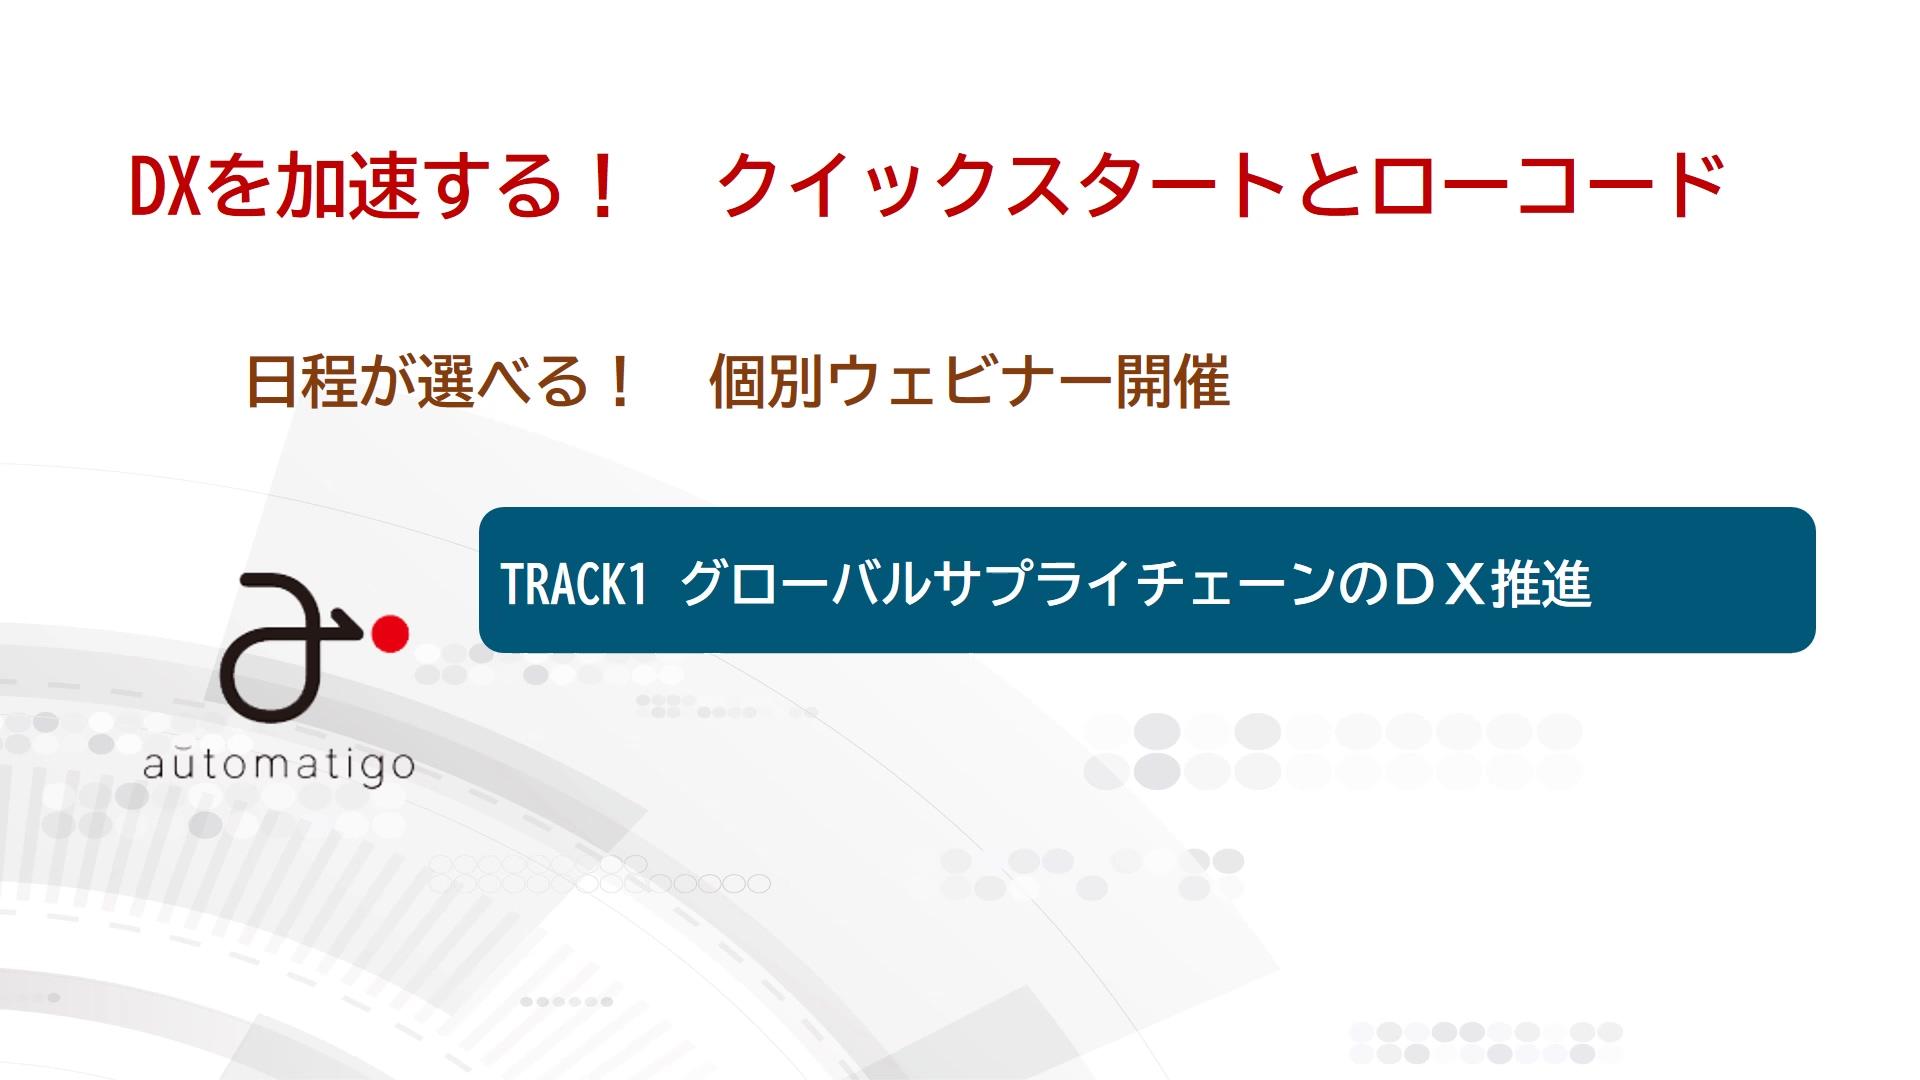 20210302Movie Track1 GSCM